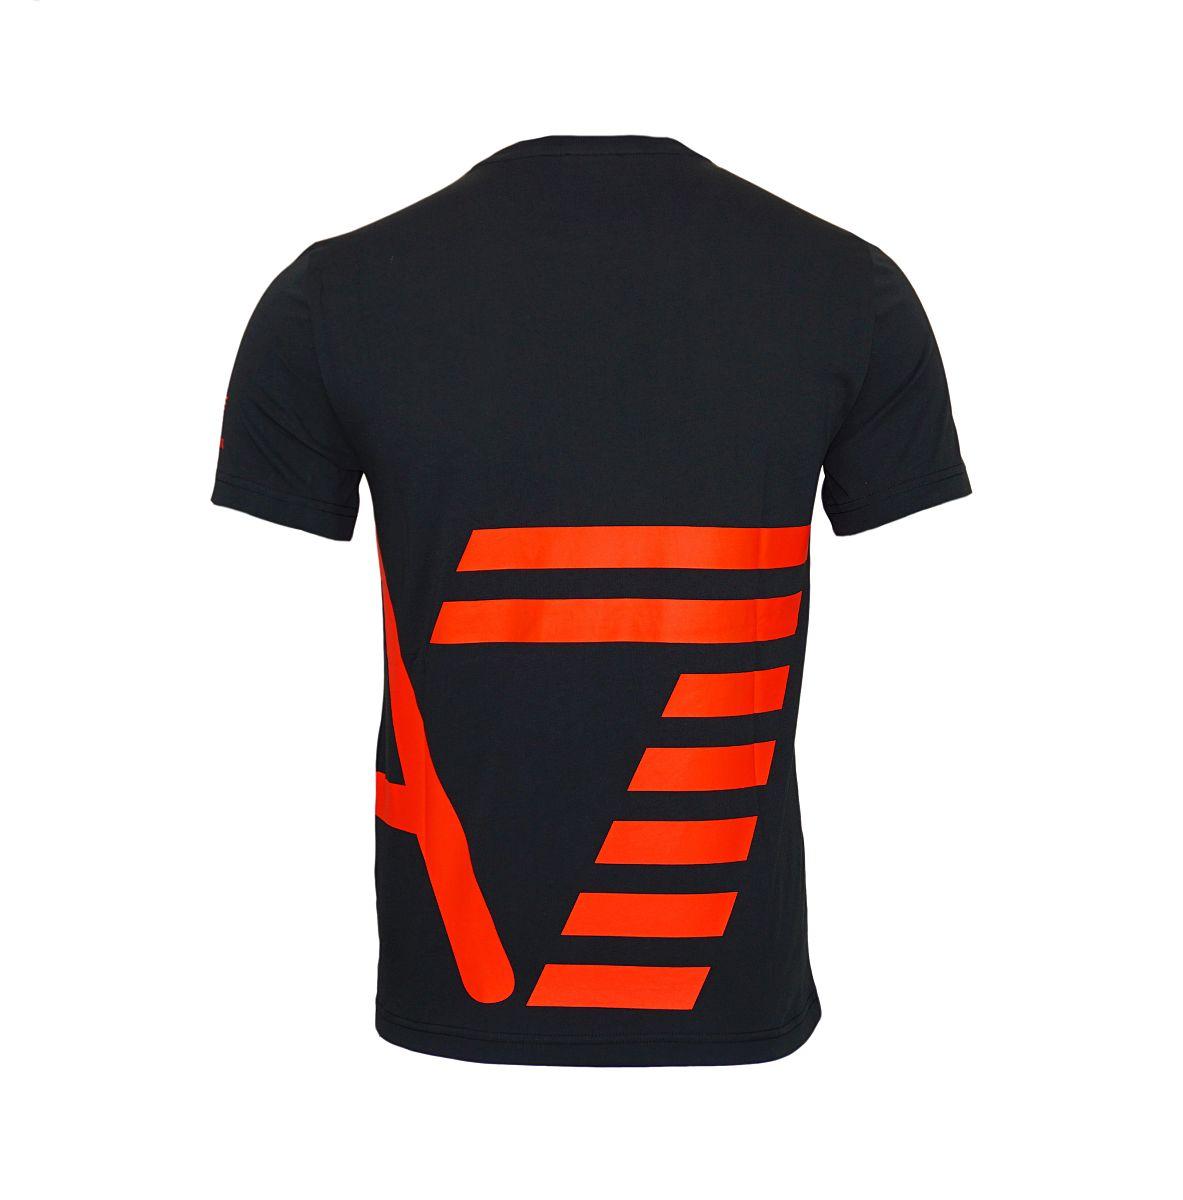 EA7 Emporio Armani T-Shirt Rundhals 6YPTB8 PJH7Z 1200 Black HW17-EATS1